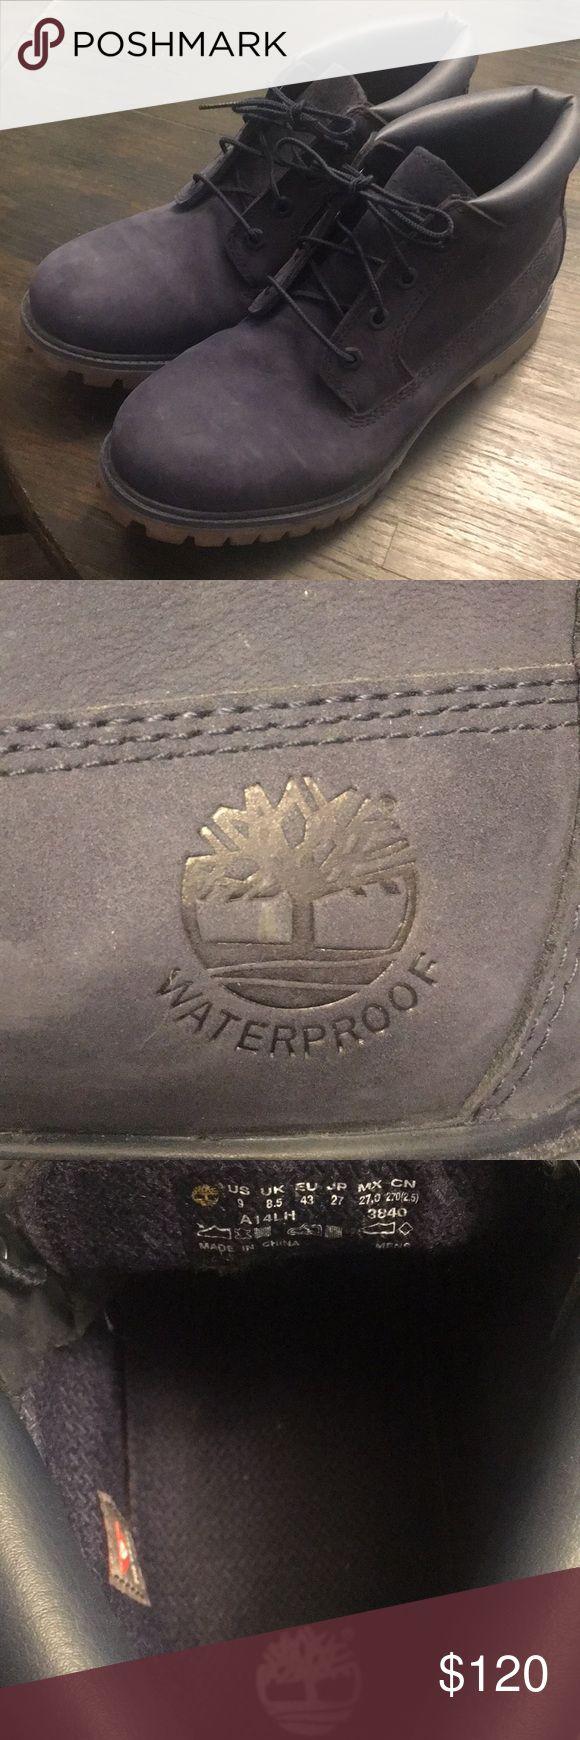 Men's Navy Timberland Boots Waterproof Never worn. Size 9. Waterproof. Navy Leather. Timberland Shoes Boots